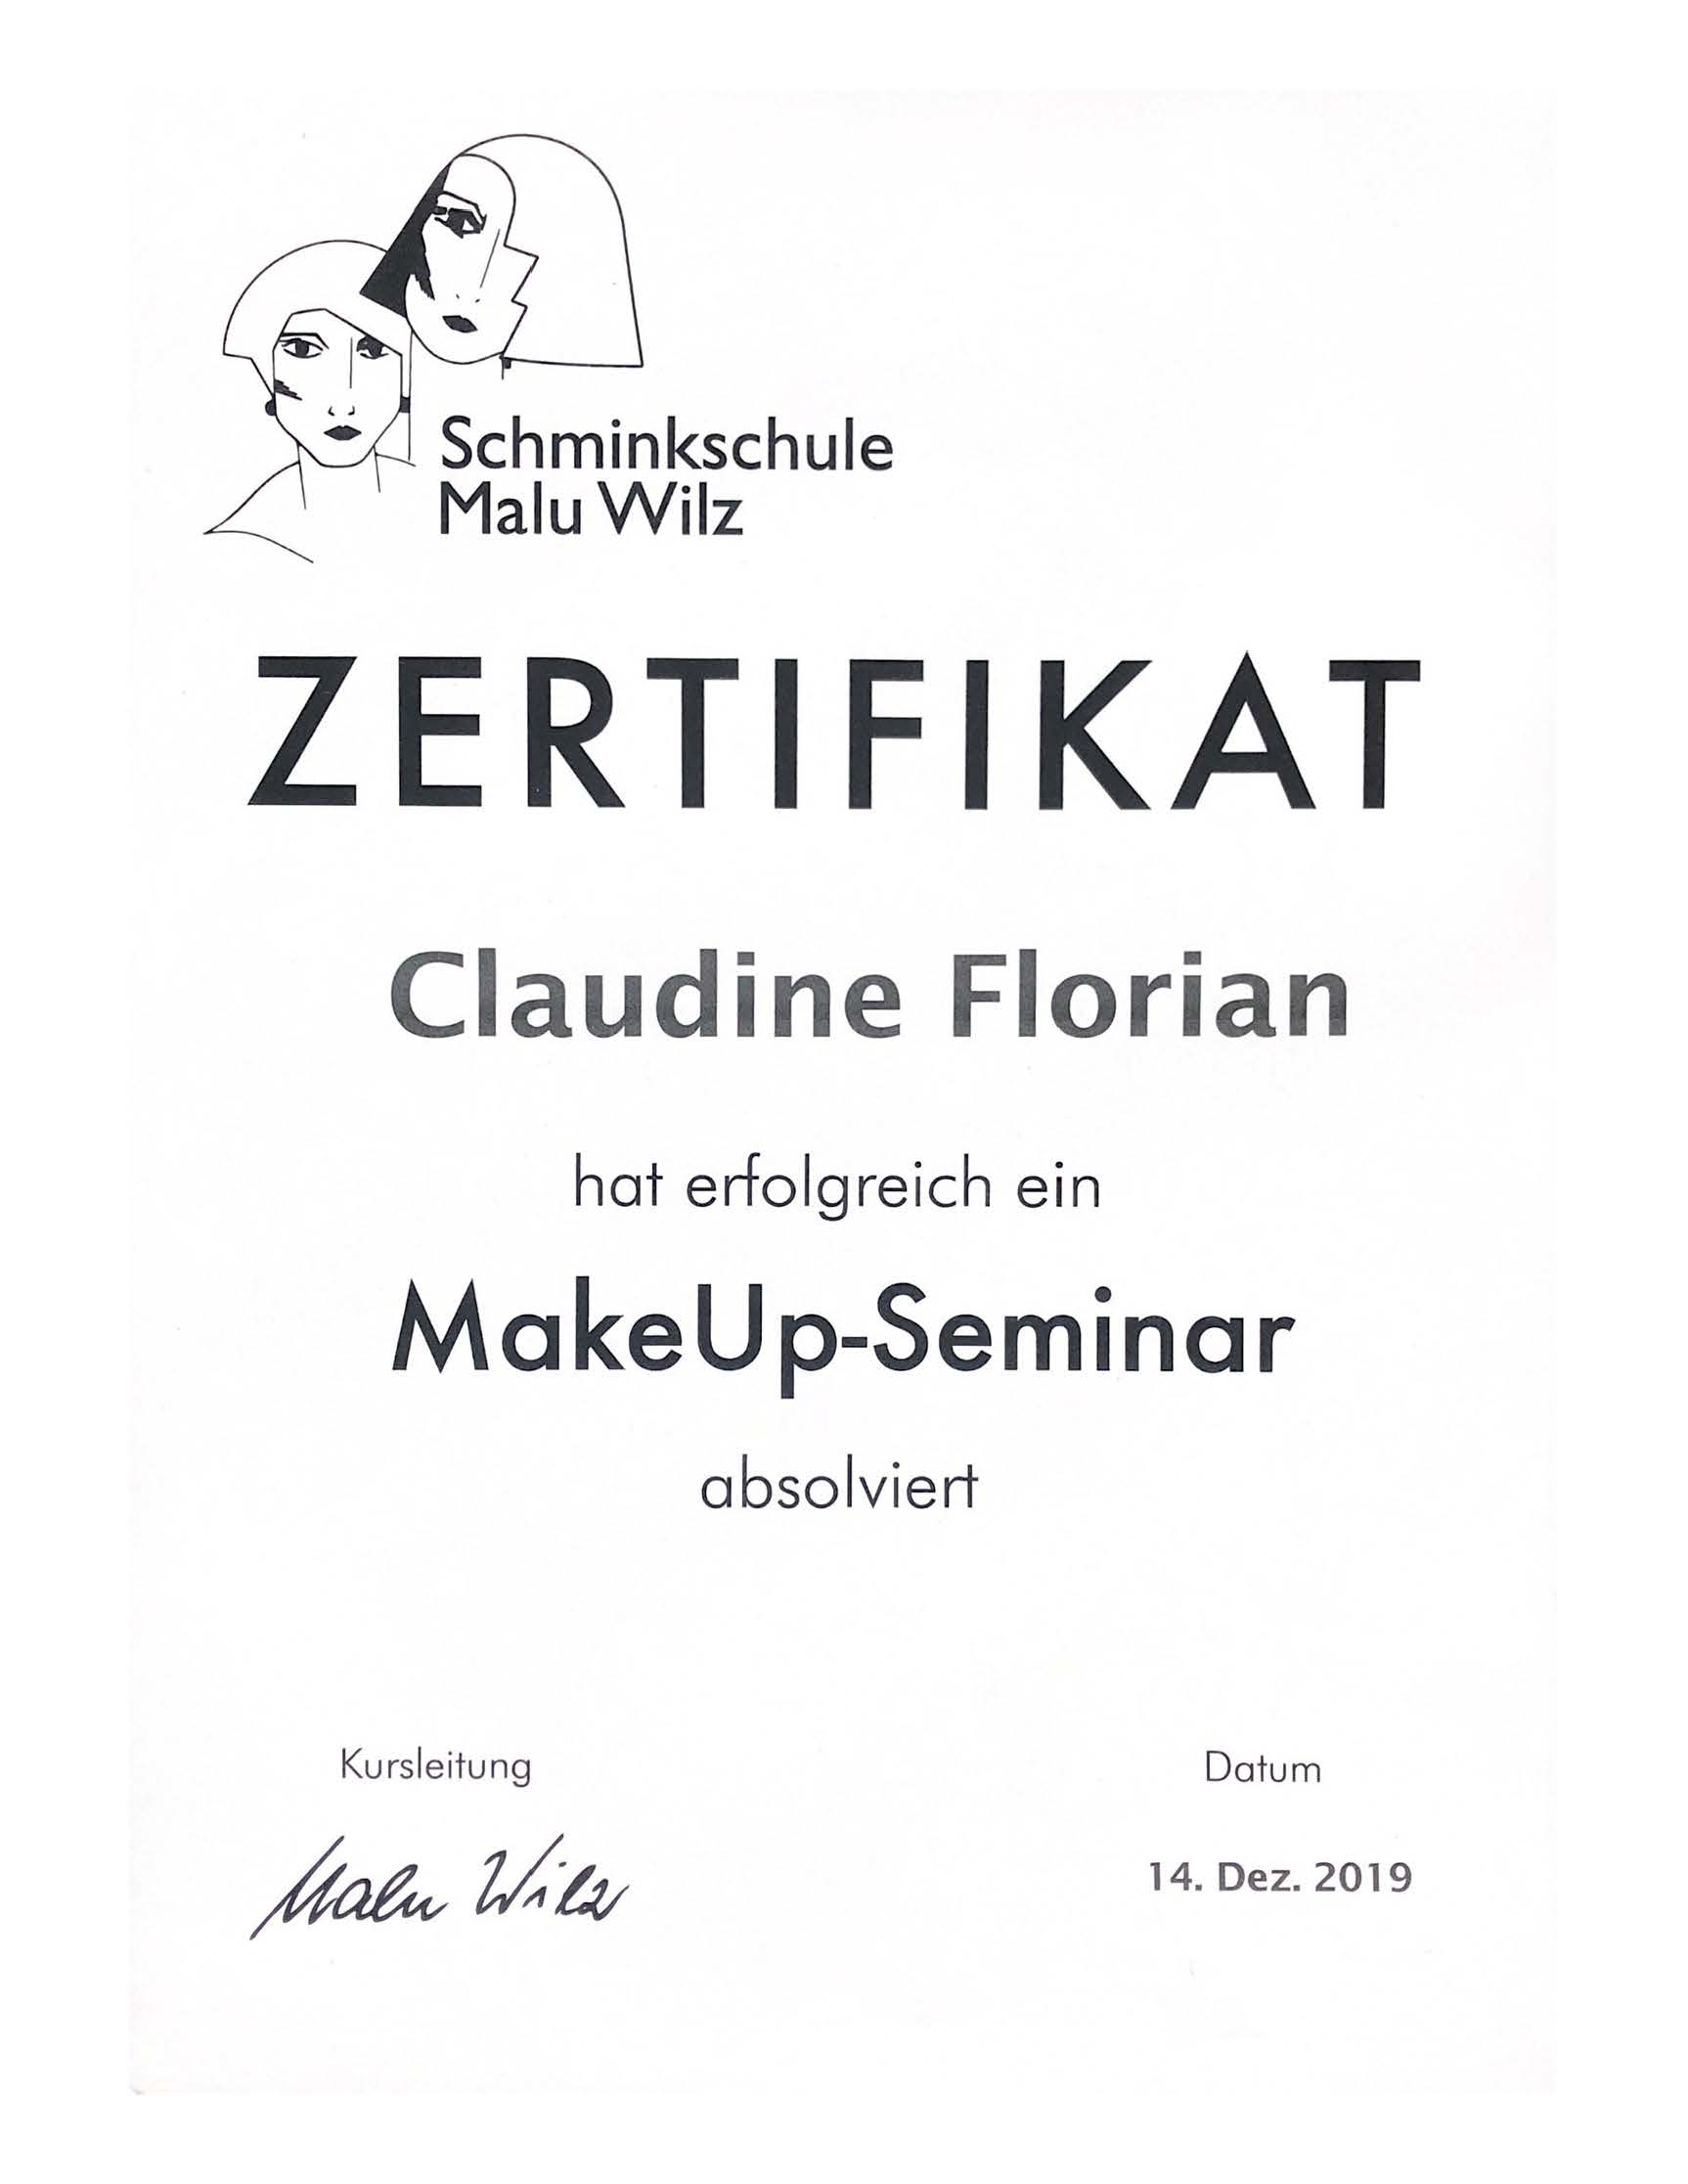 Zertifikat_claudine